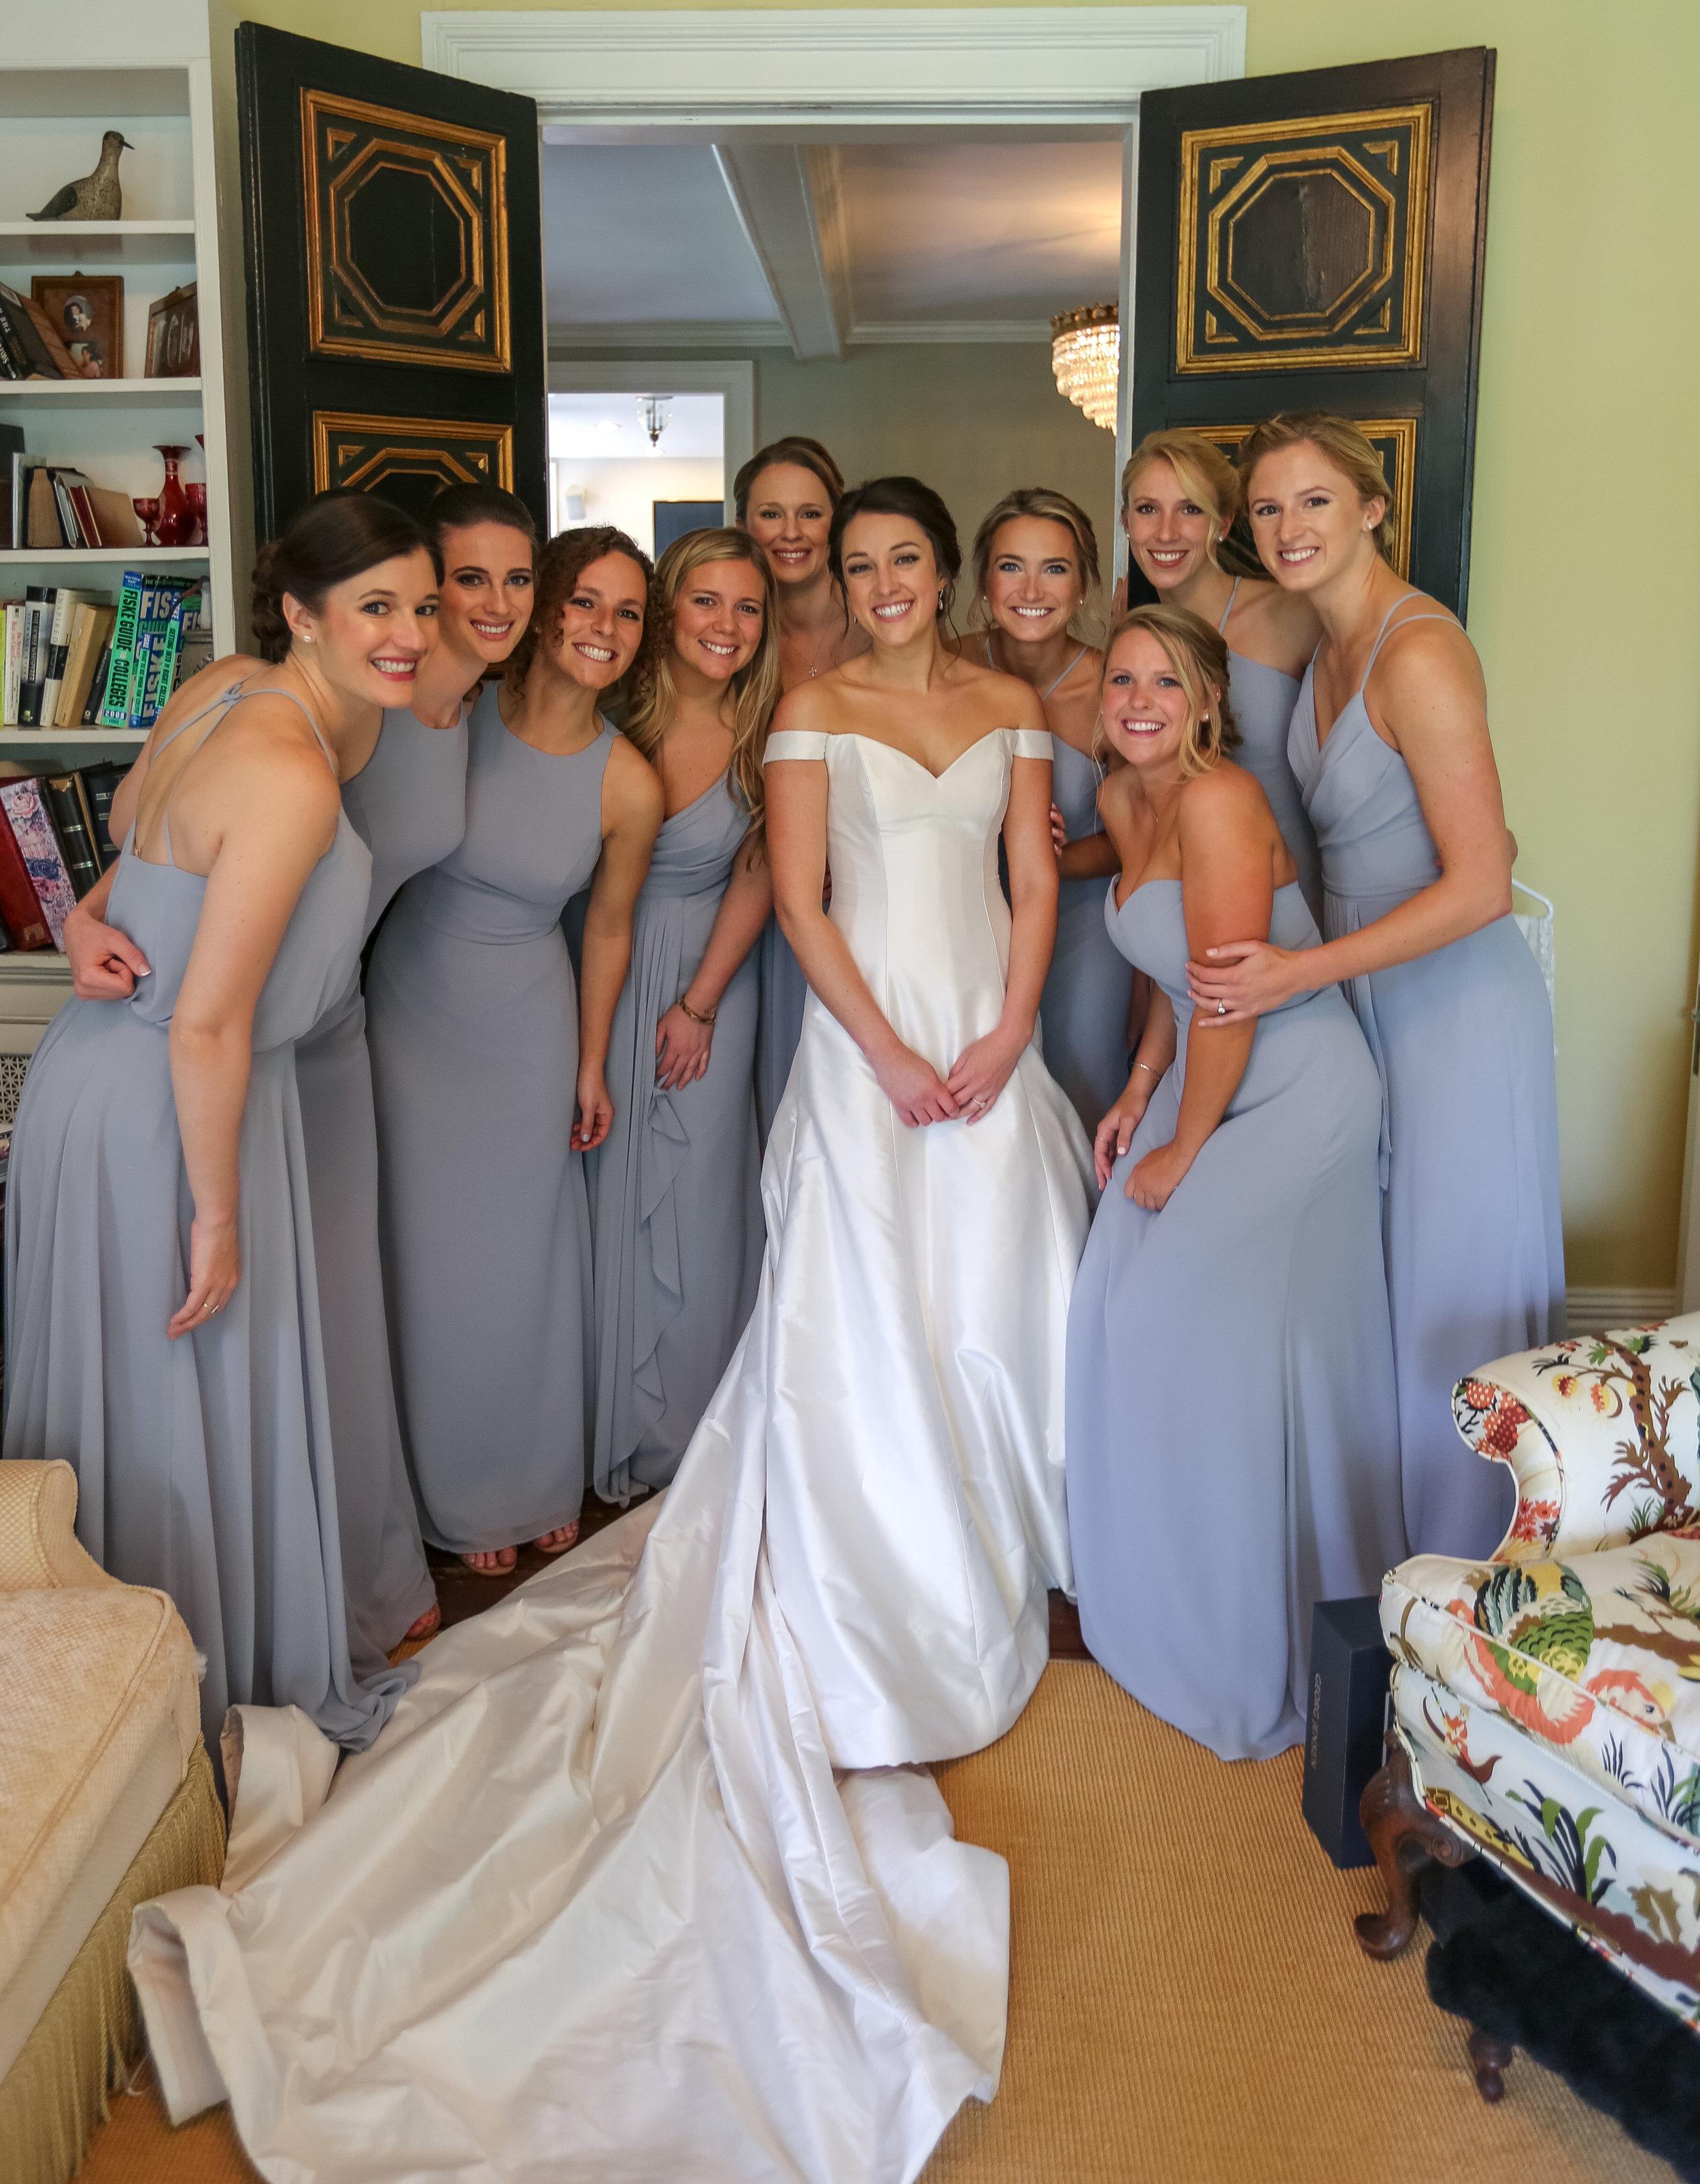 Jeremie_Barlow_Photography_Steffen_Sudyam_wedding_2018-238.jpg